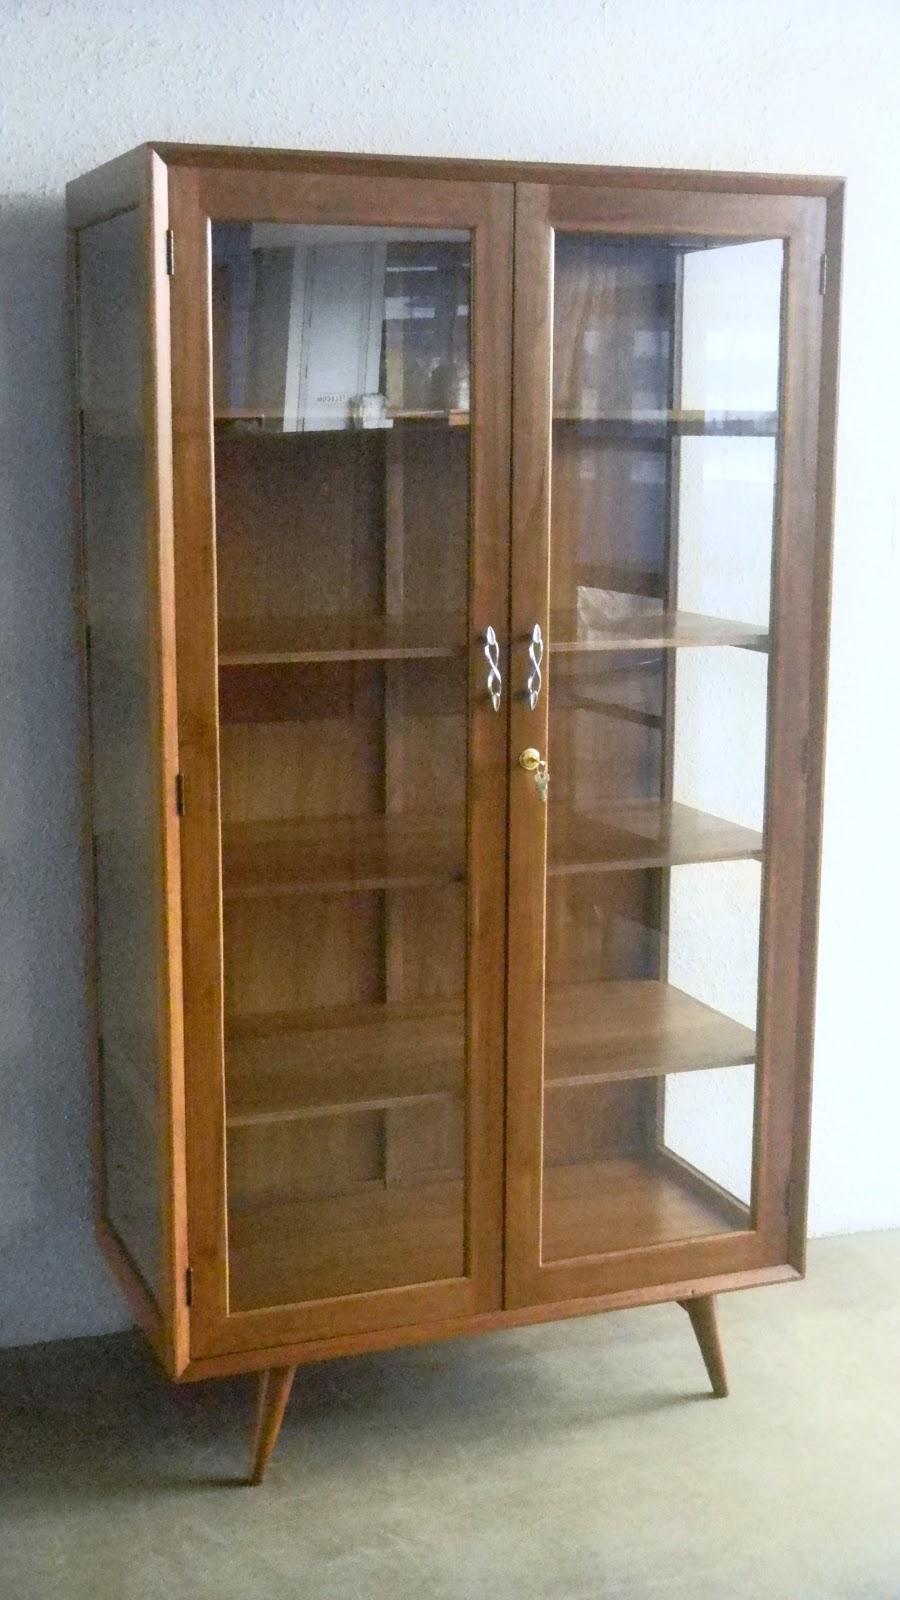 Vintage Display Cabinets 48